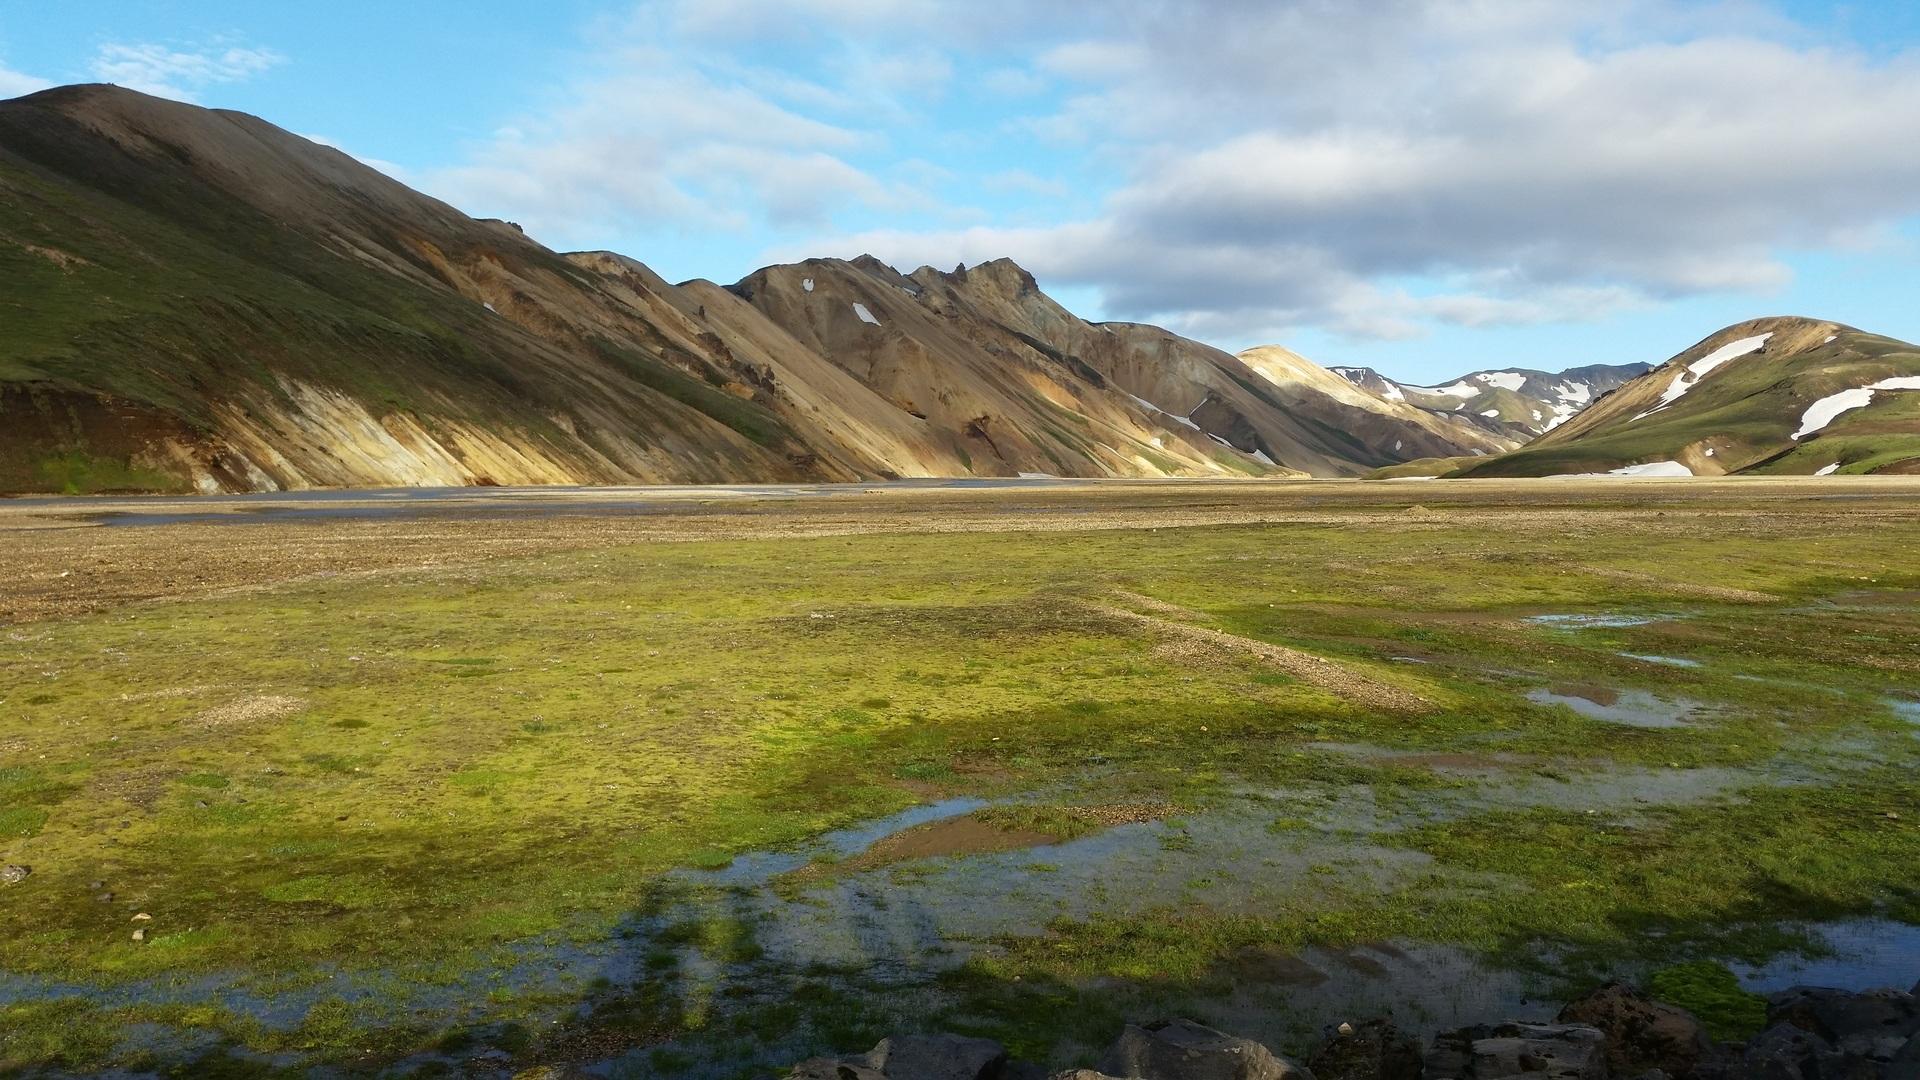 26 juillet : du volcan Hekla à Landmannalaugar